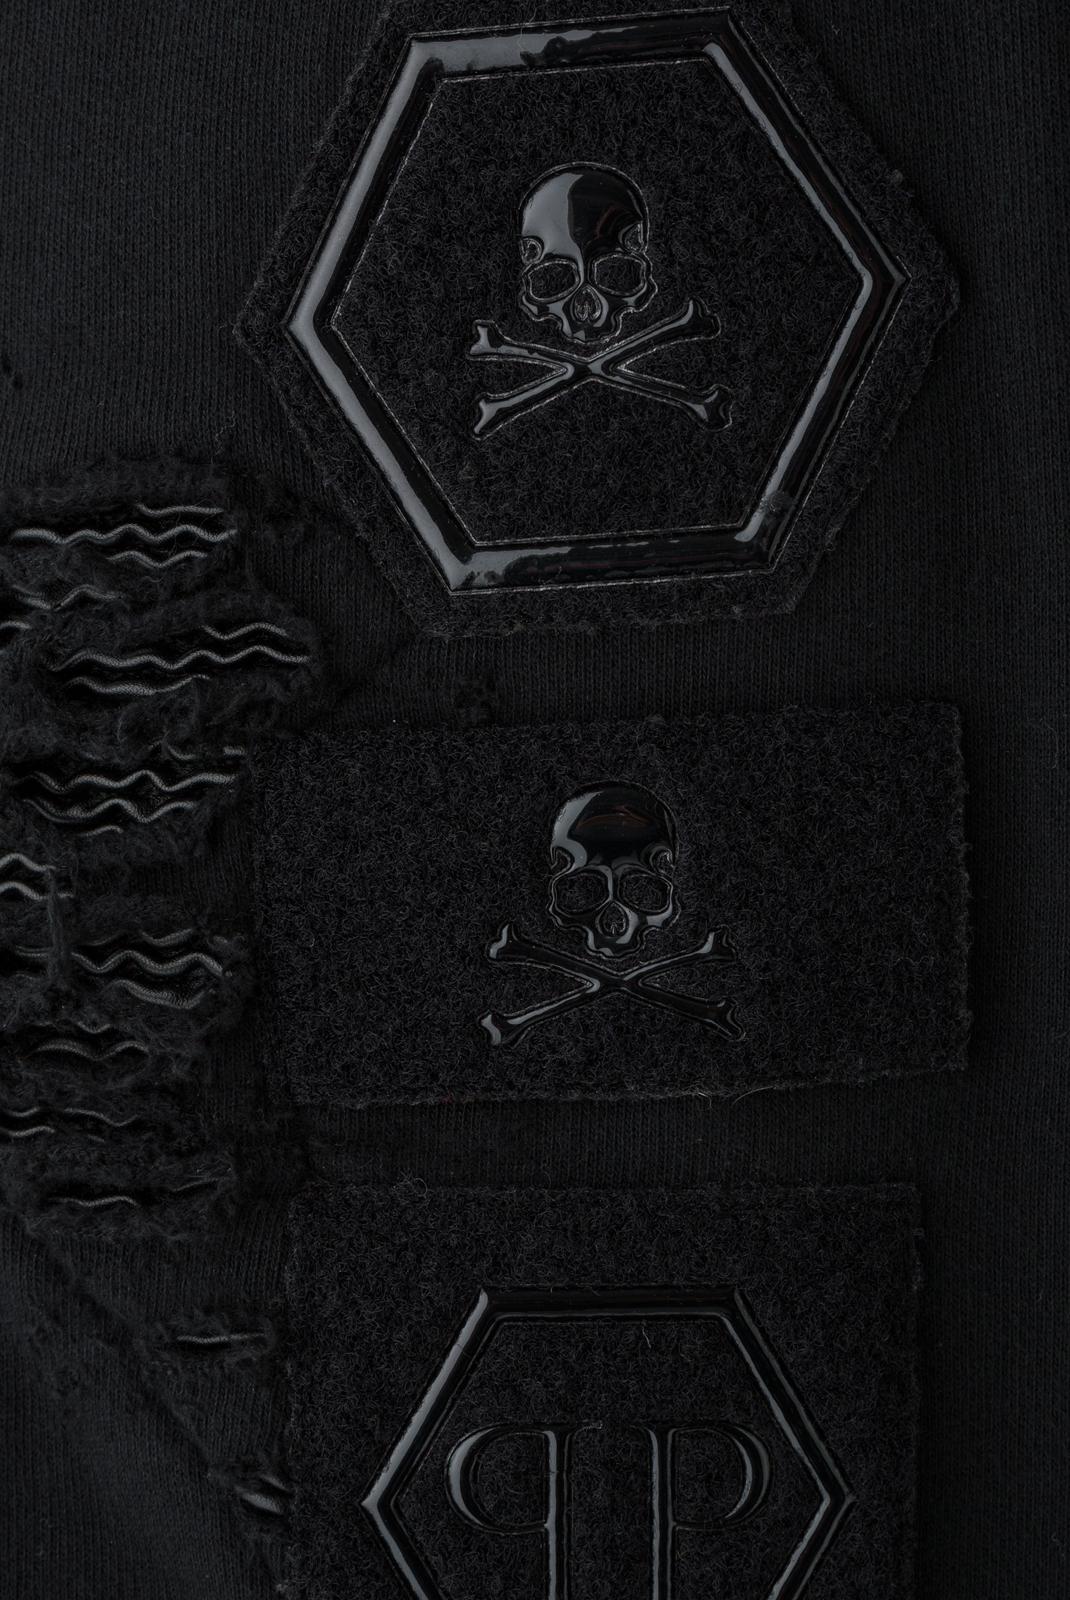 Vestes zippées  Philipp plein MJB0238 BLACK